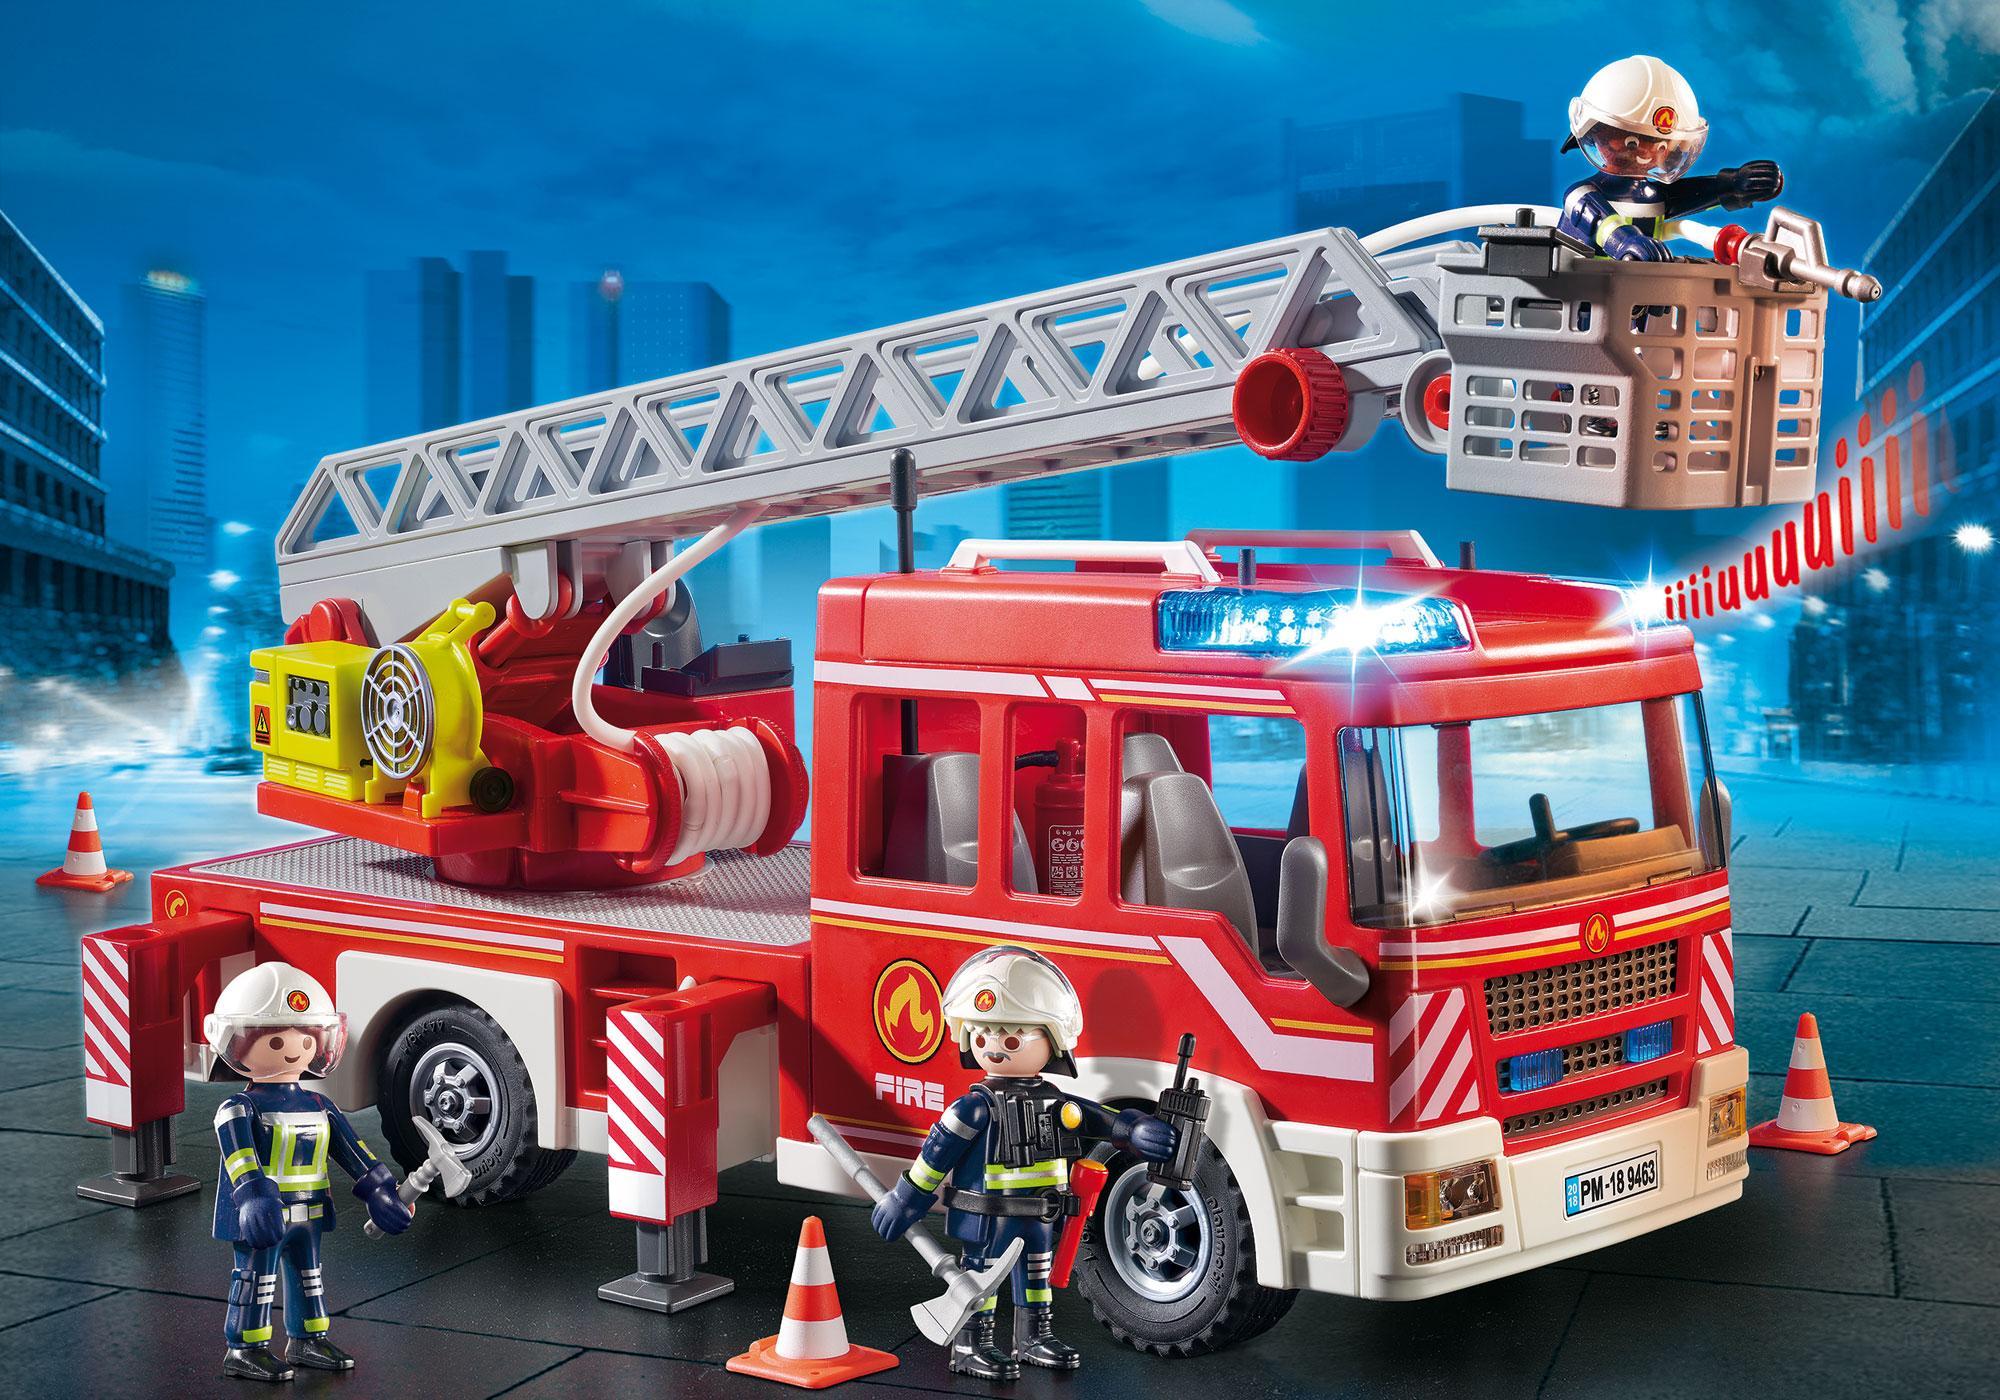 http://media.playmobil.com/i/playmobil/9463_product_detail/Samochód strażacki z drabiną